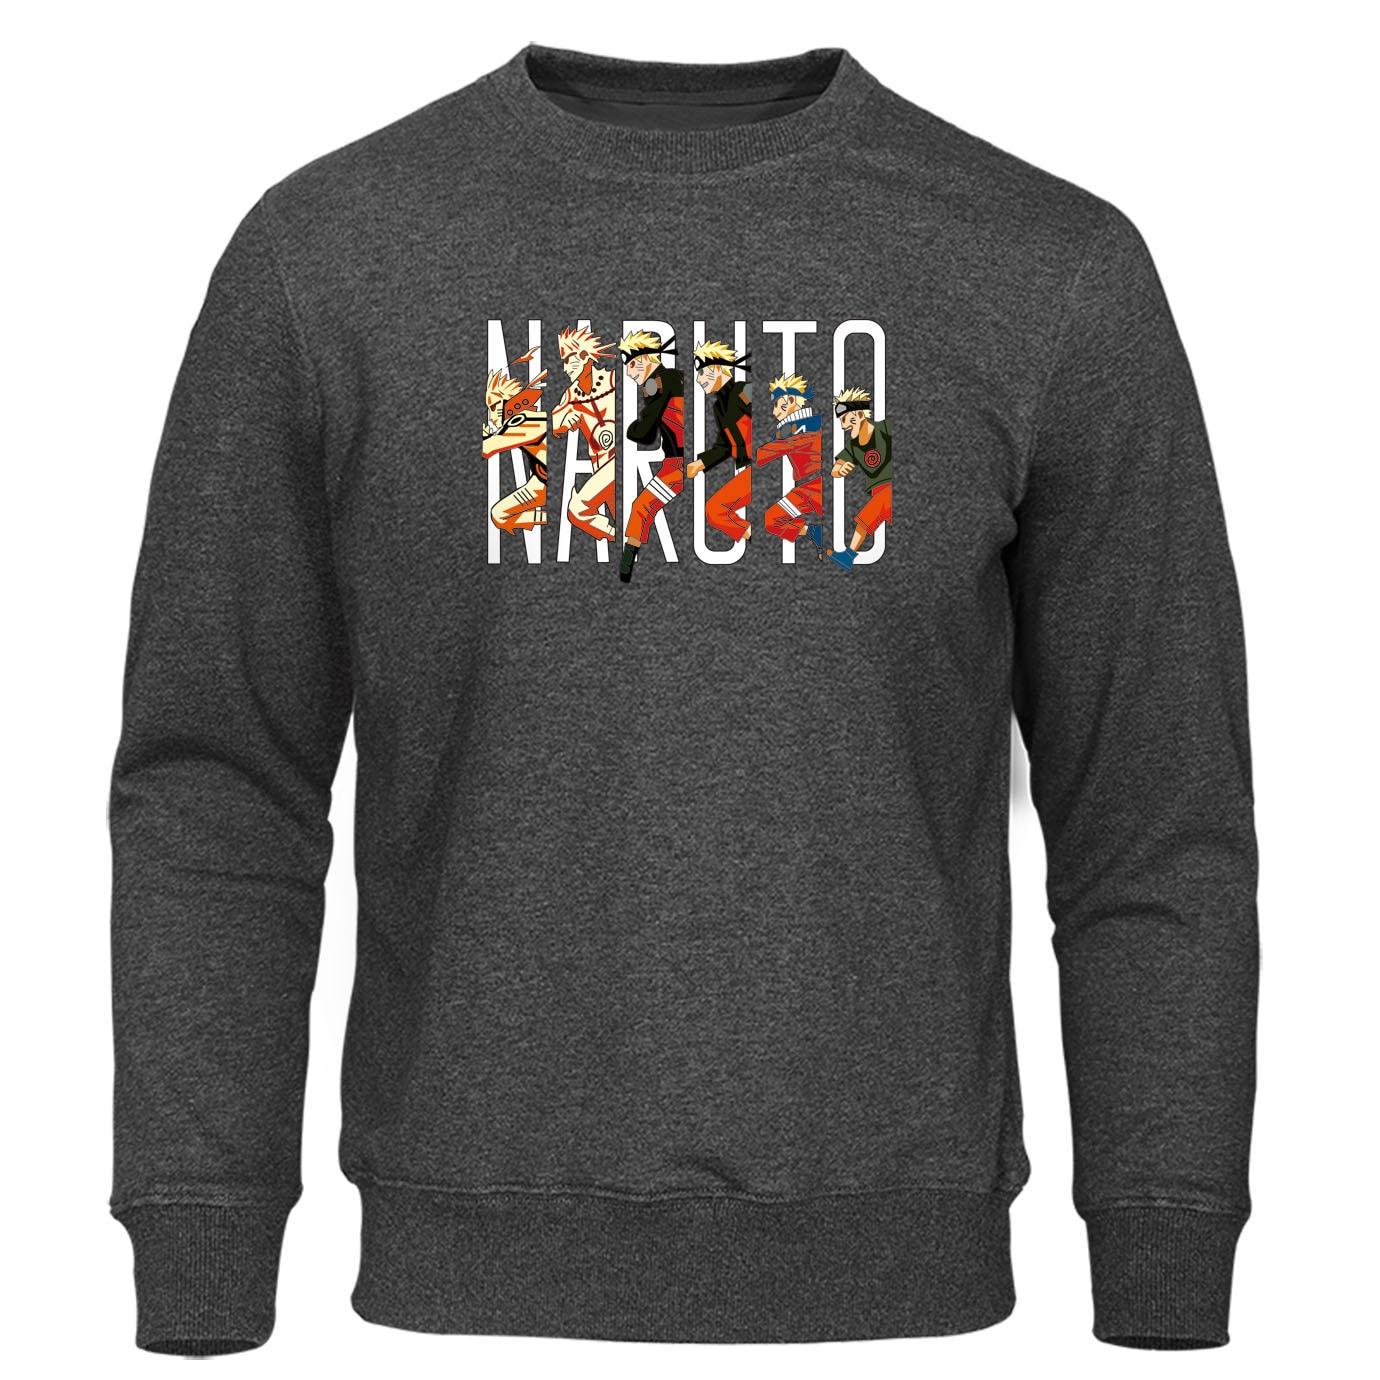 Japanese Anime Naruto Sweatshirt Men Hoodies Crewneck Pullover Fashion Hip Hop Men's Sweatshirts Winter Autumn Harajuku Hoody